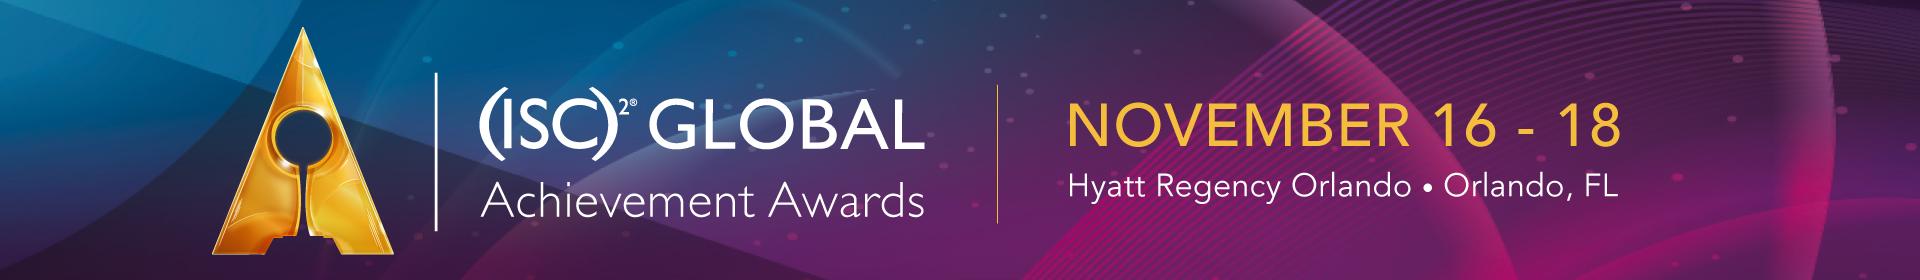 2020 Global Achievement Awards Event Banner